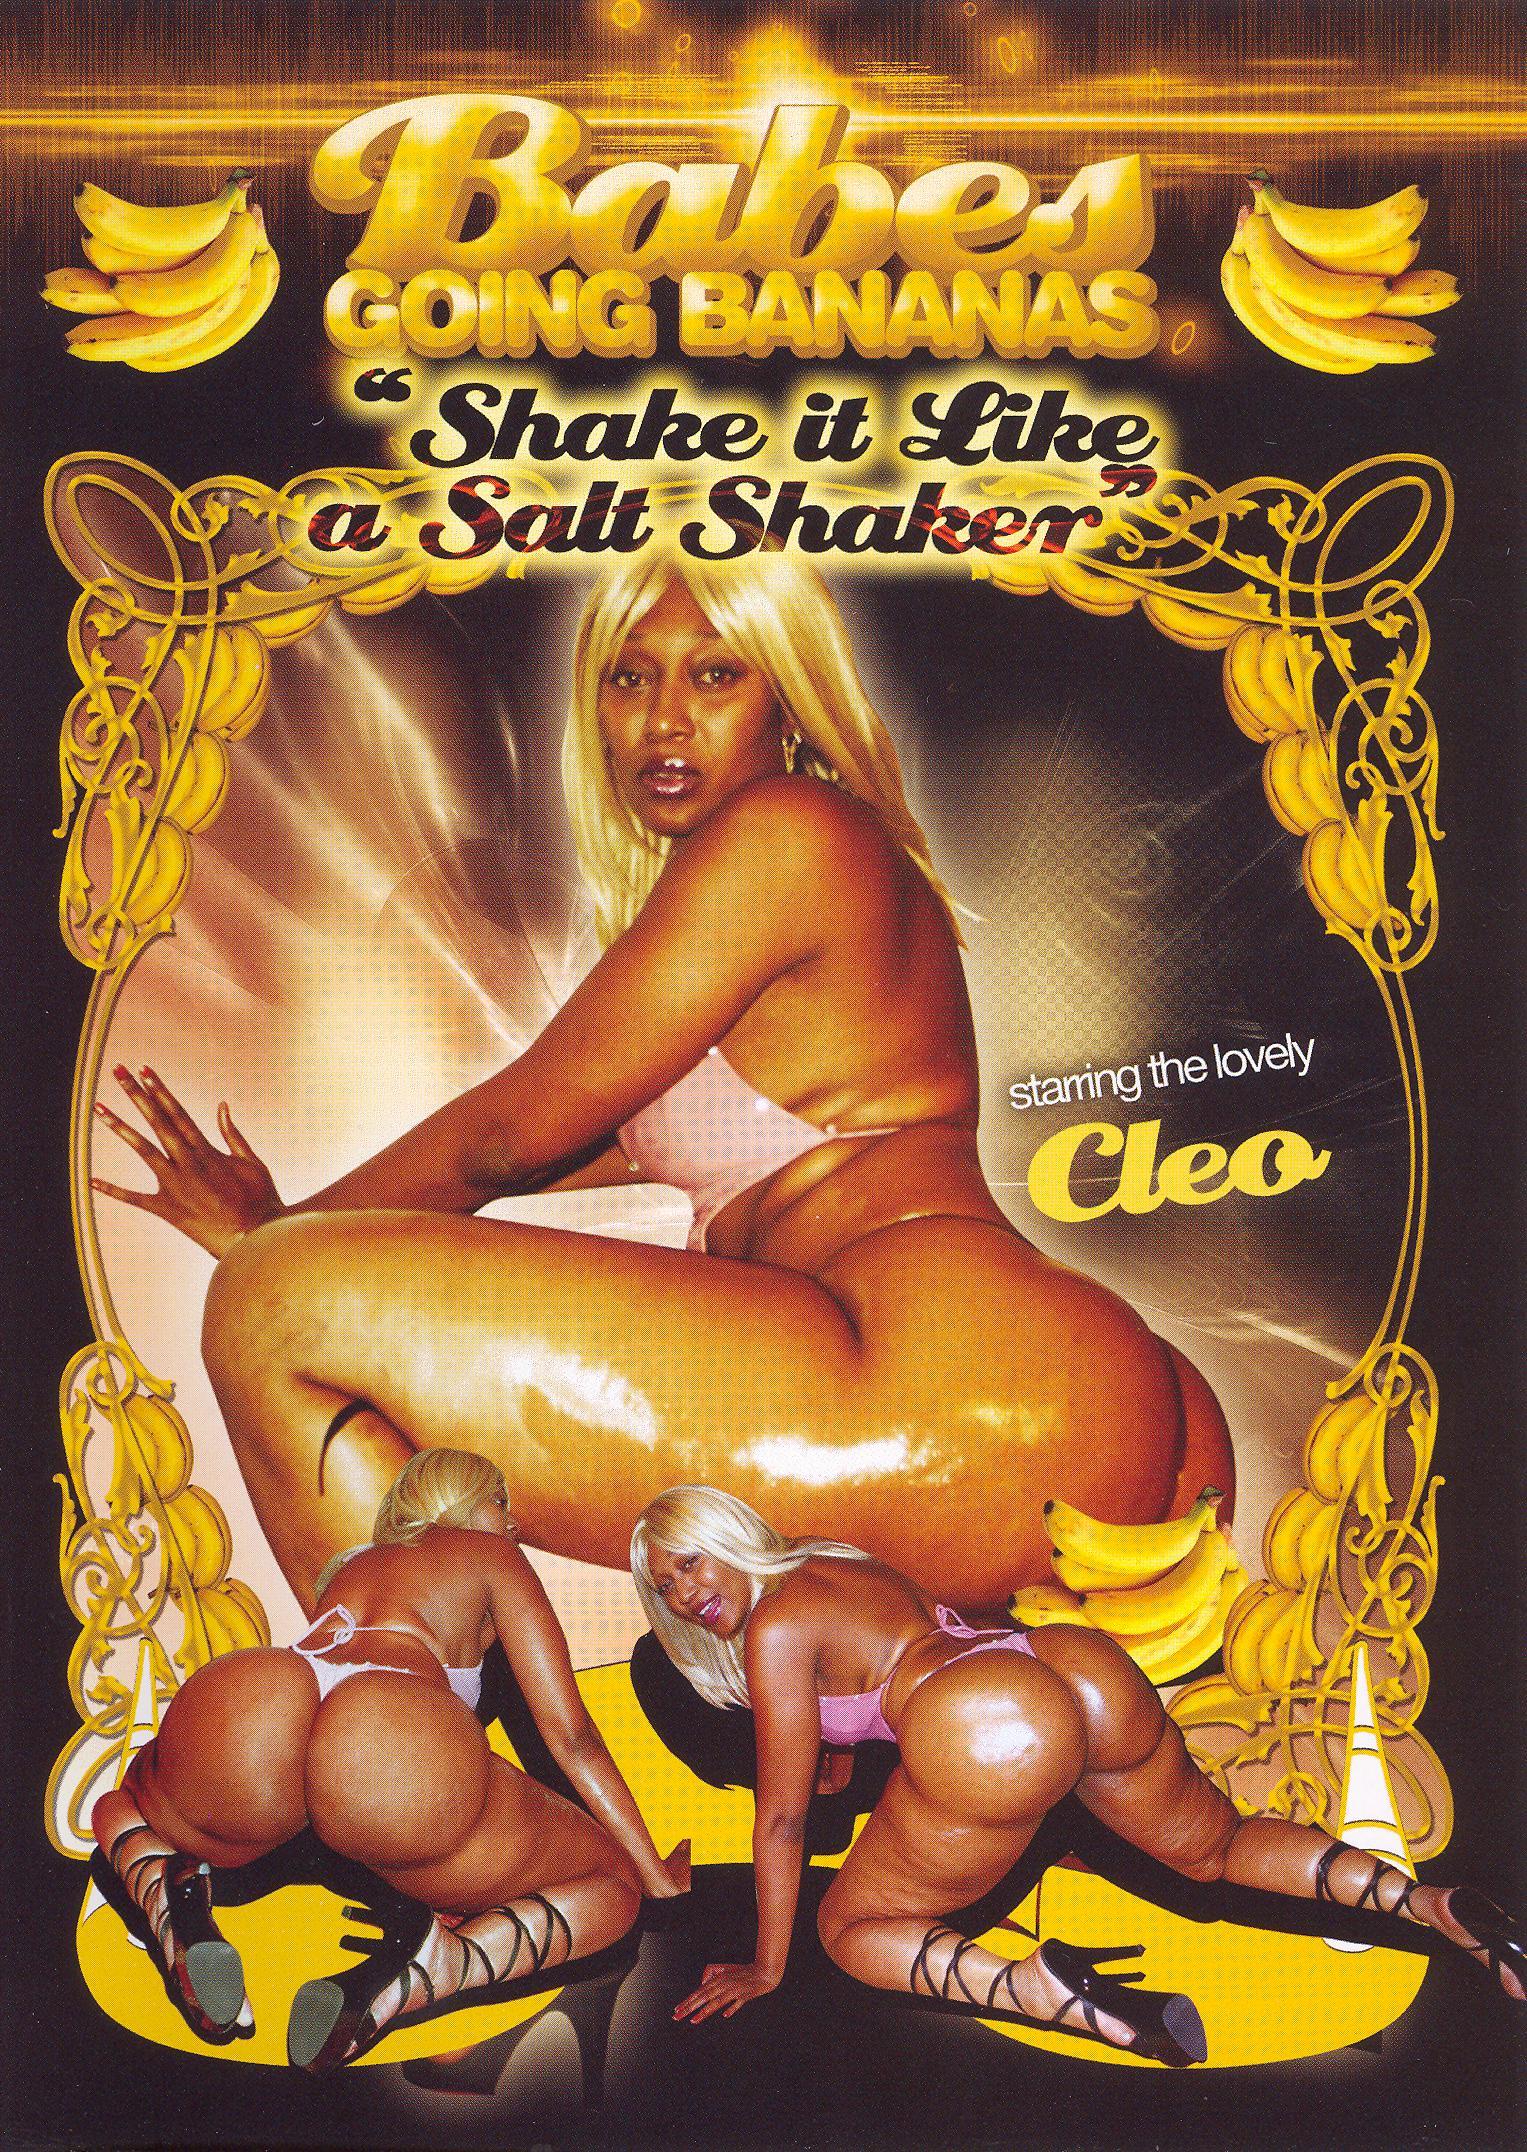 Babes Going Bananas: Shake It Like a Salt Shaker